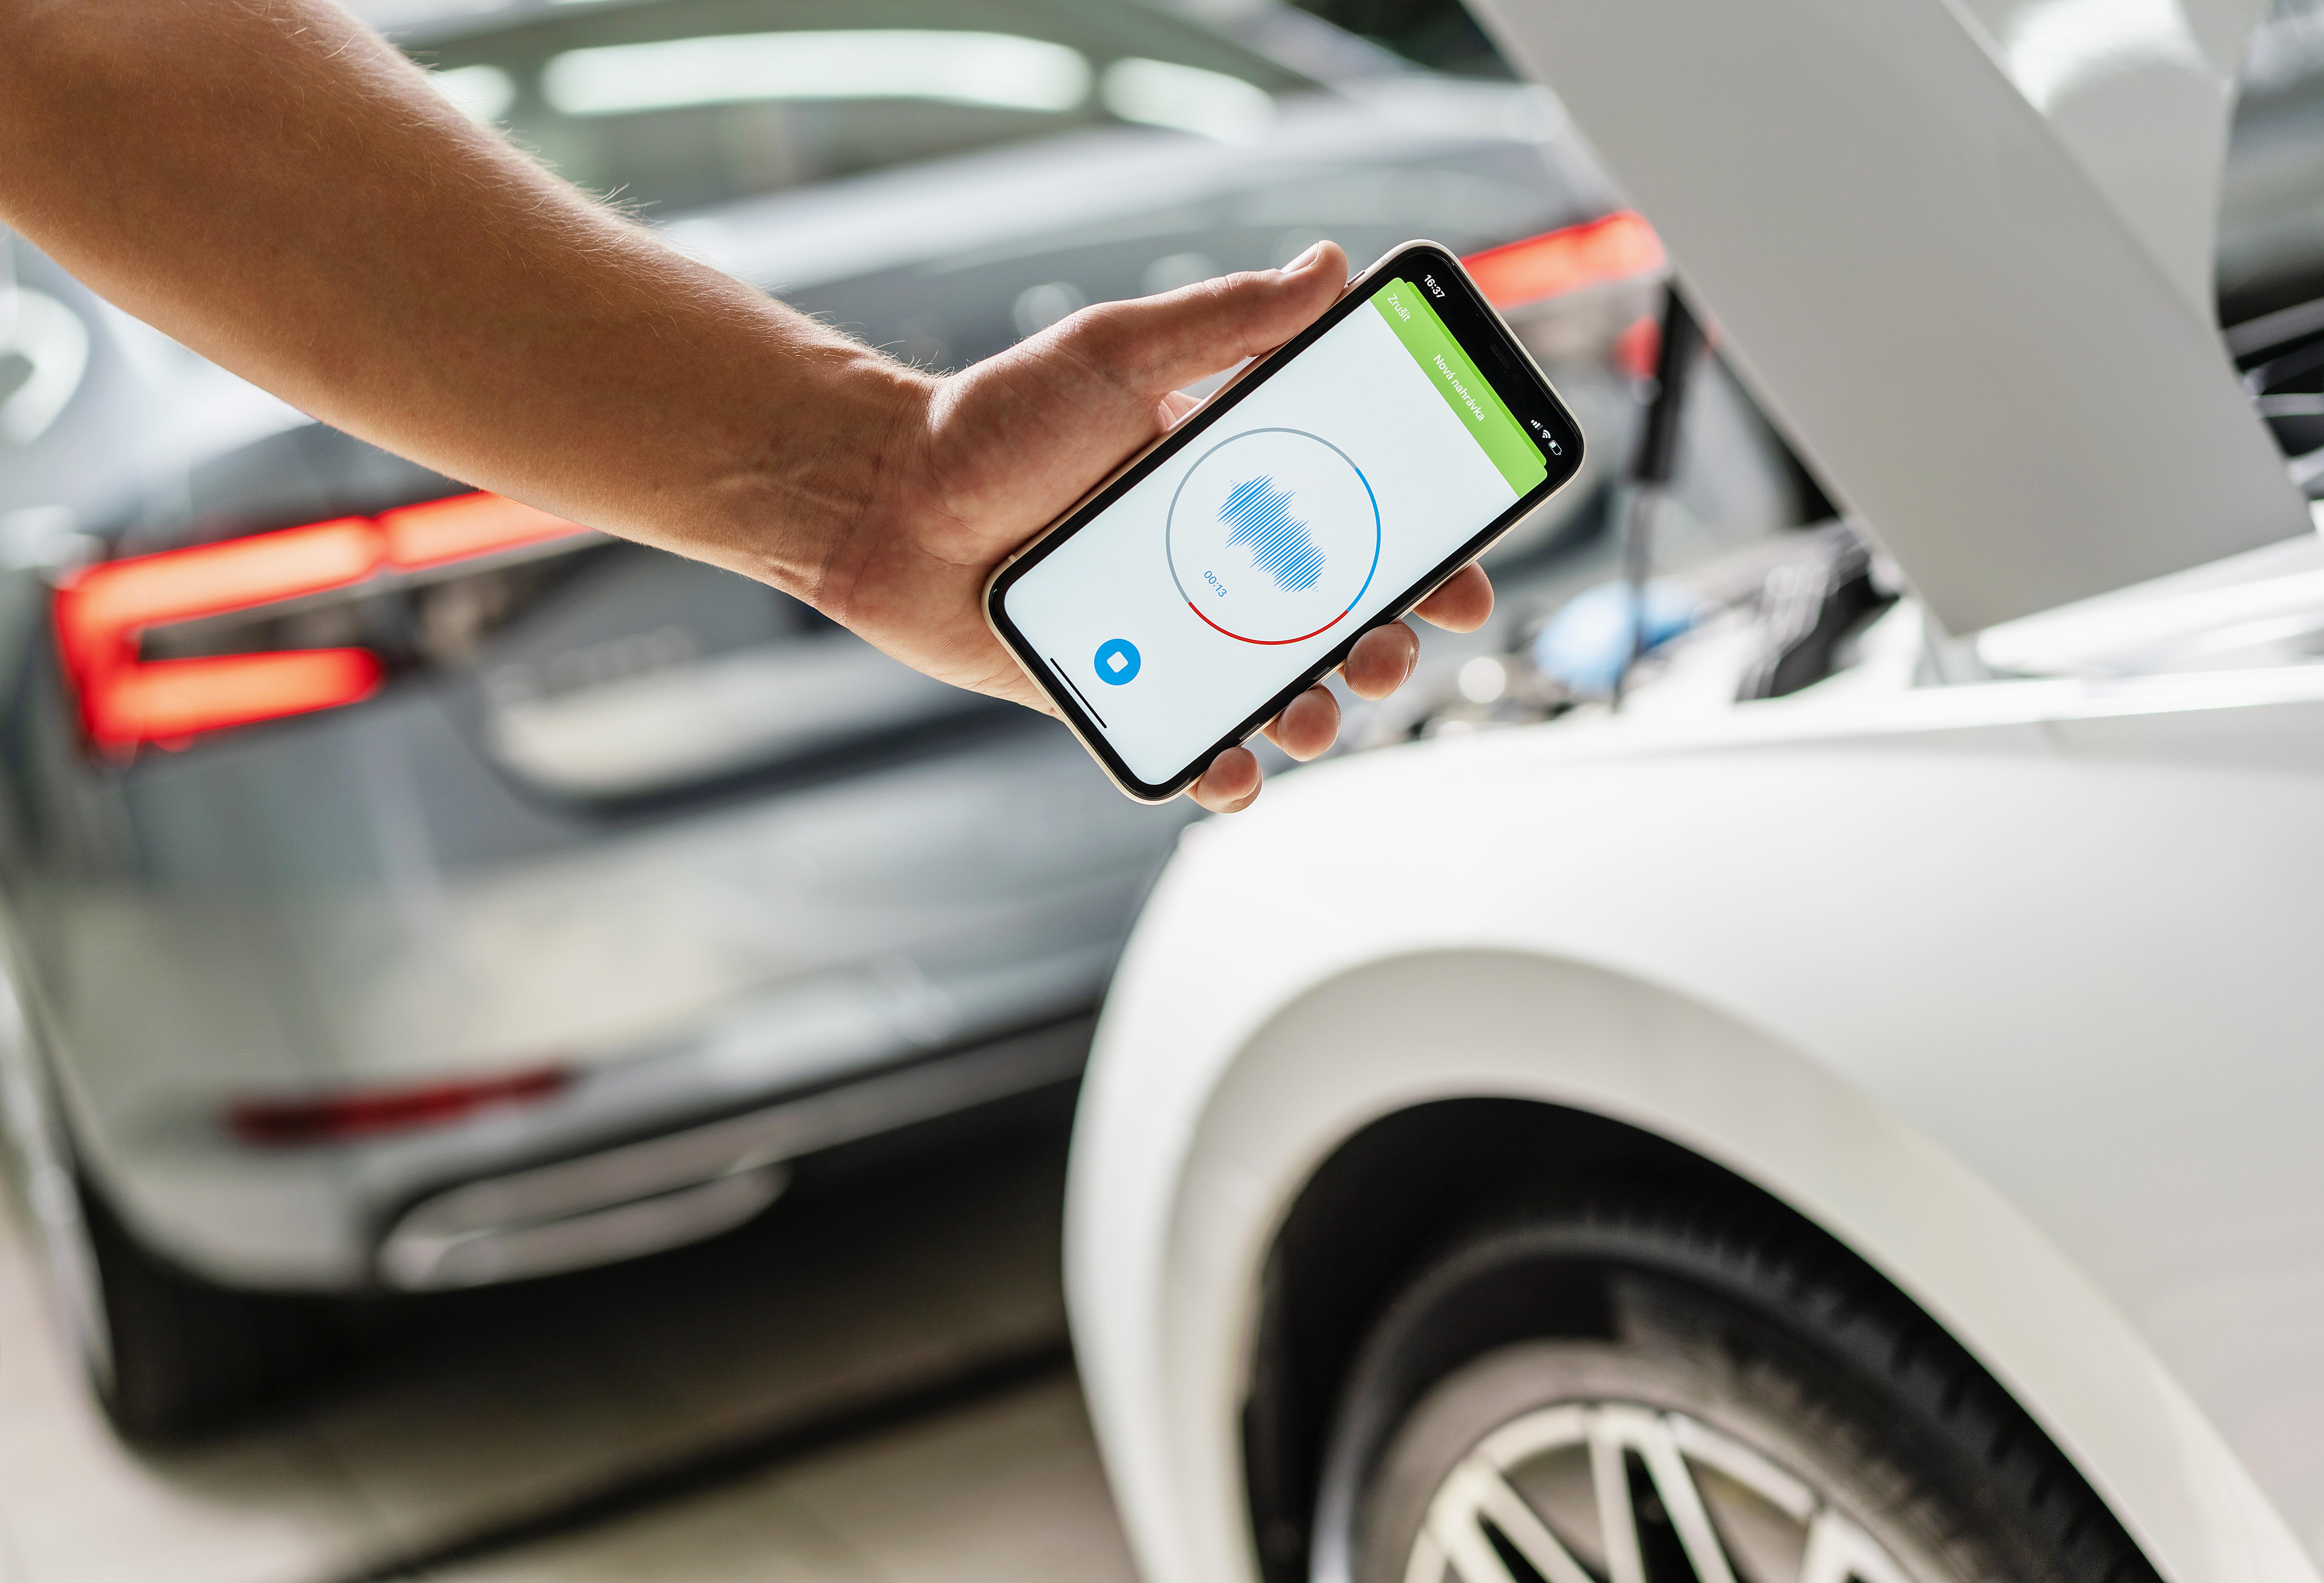 SKODA AUTO uses artificial intelligence for even more accurate car diagnostics - Image 4